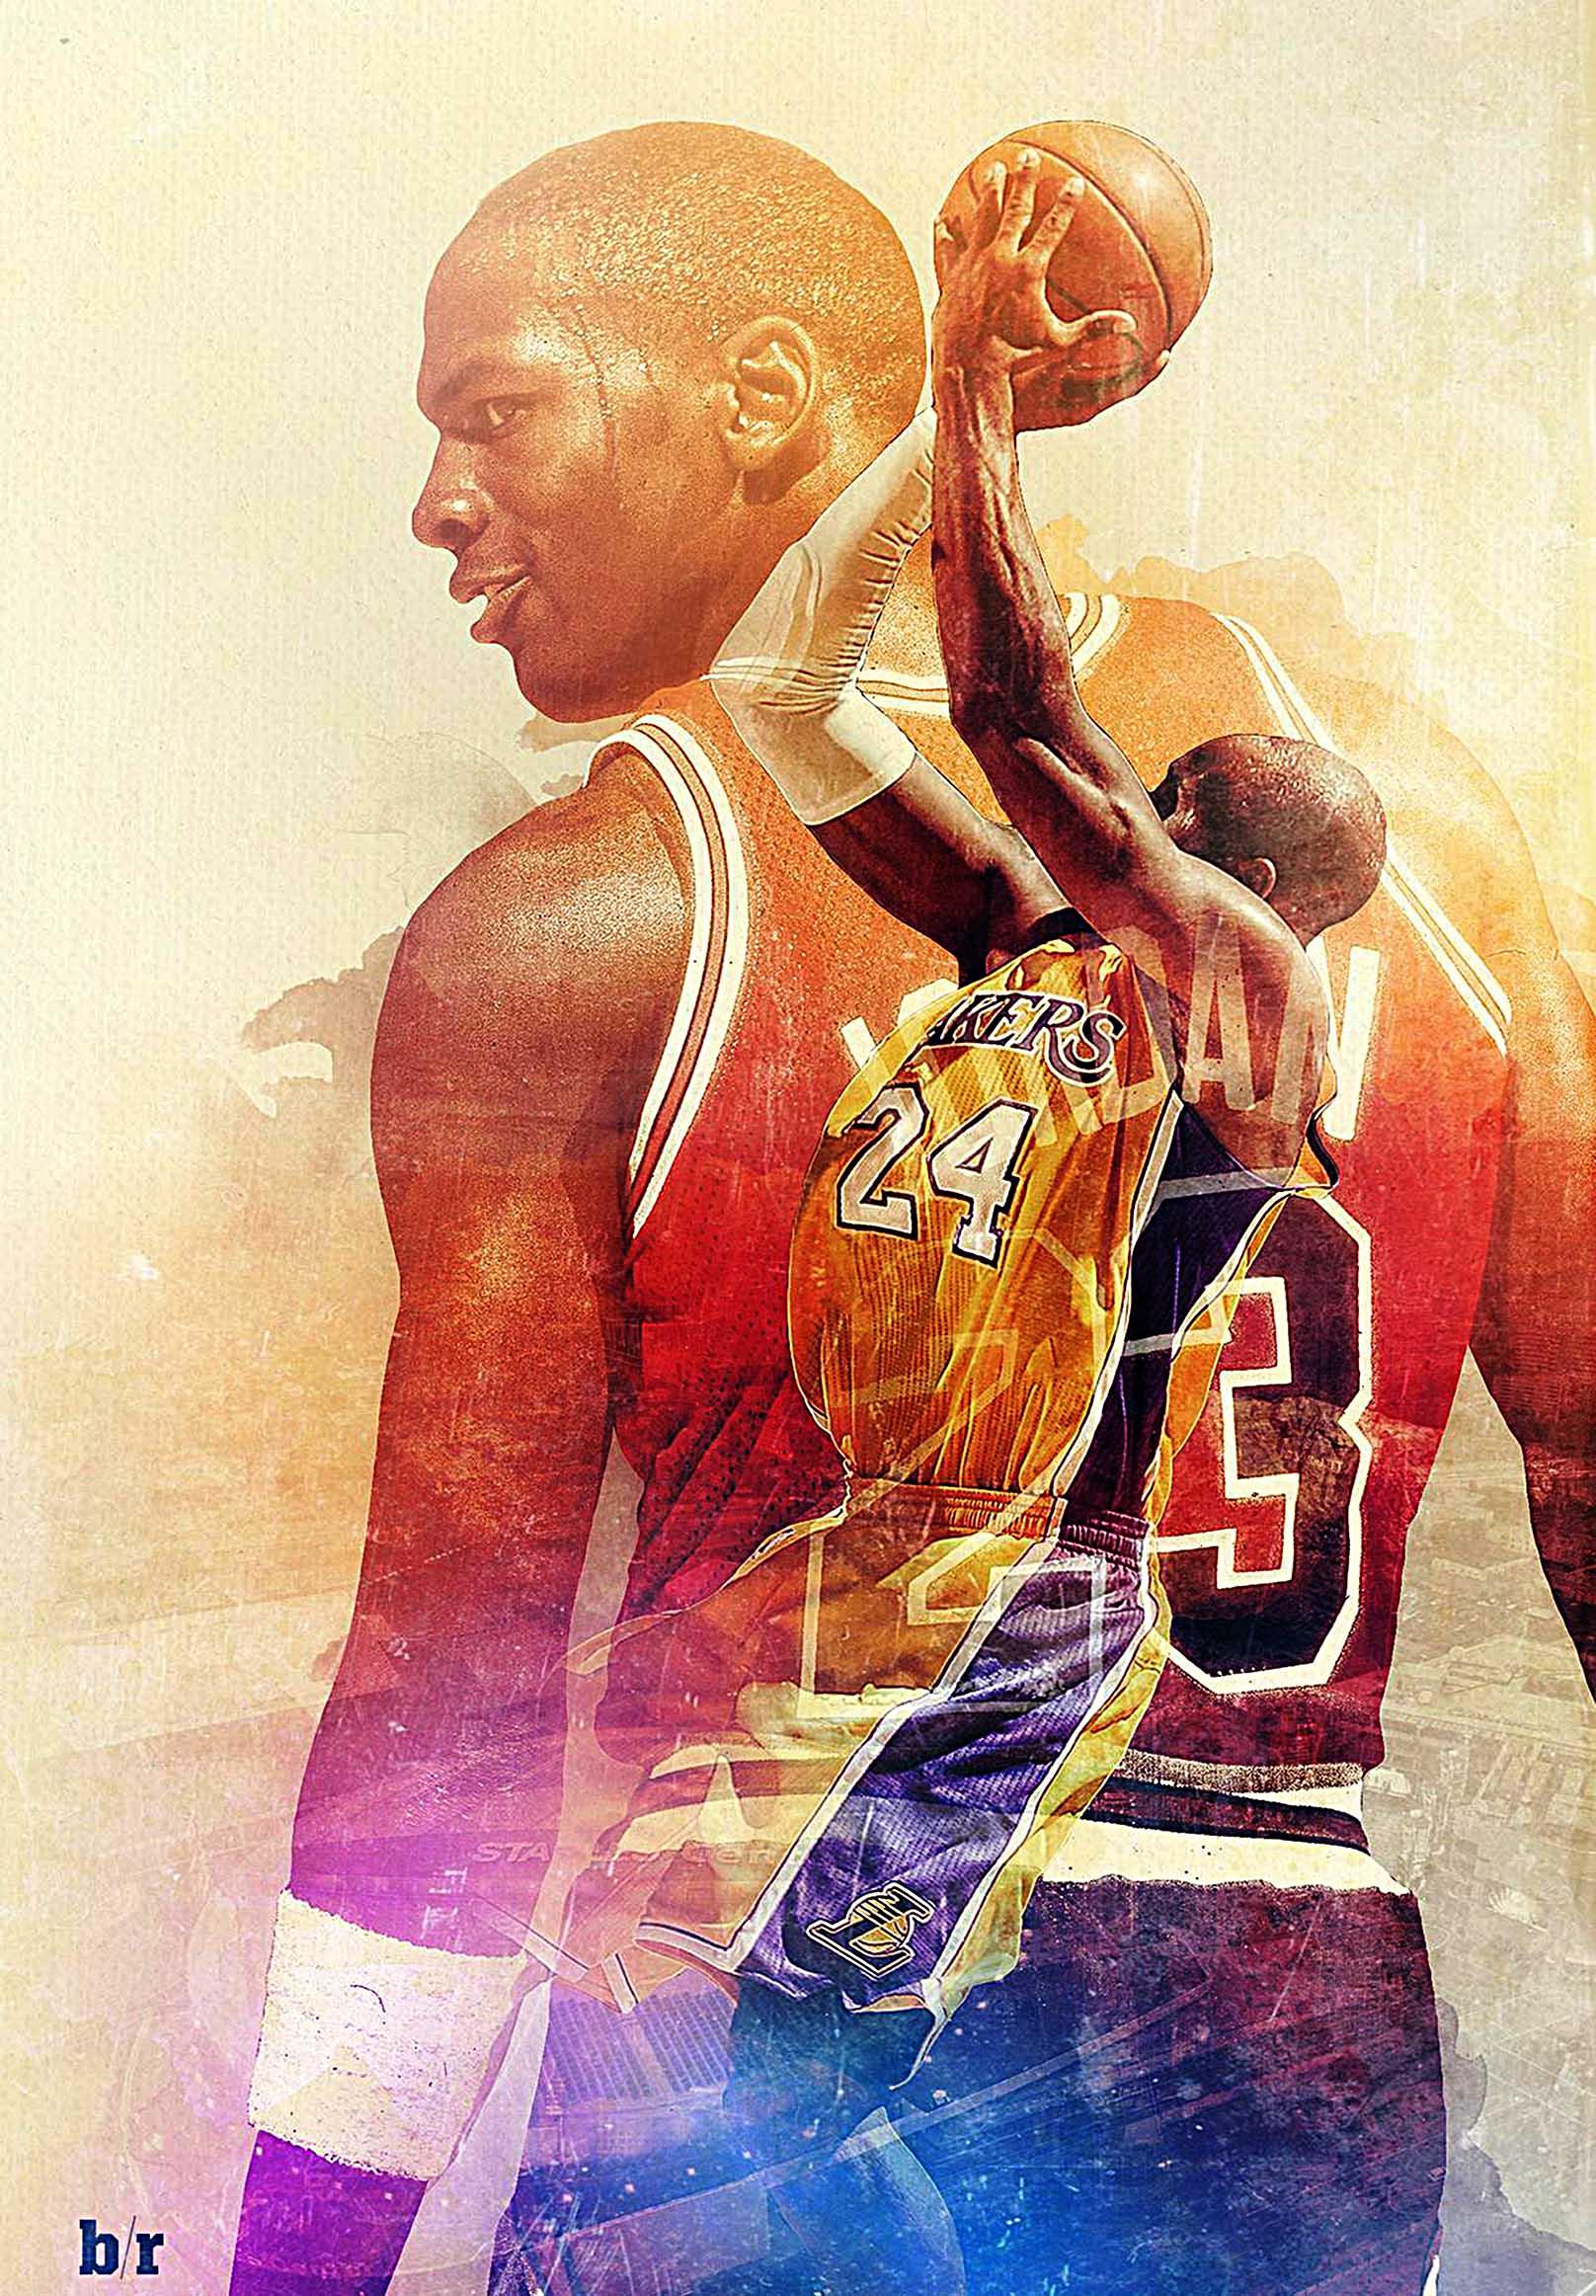 Michael Jordan Canvas Tablo (Nba-canvas-jordanmj)